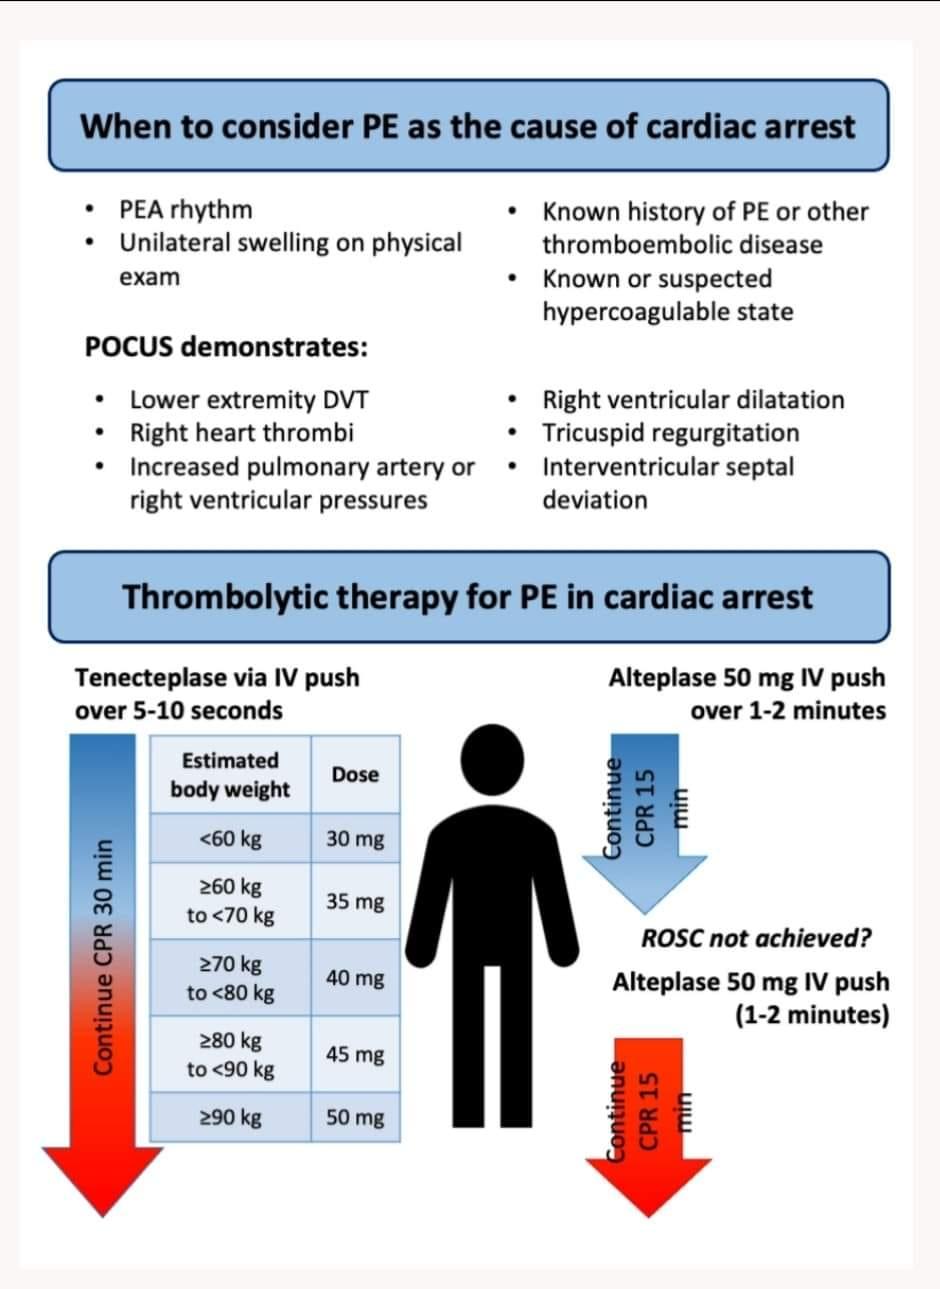 Thrombolysis in cardiac arrest